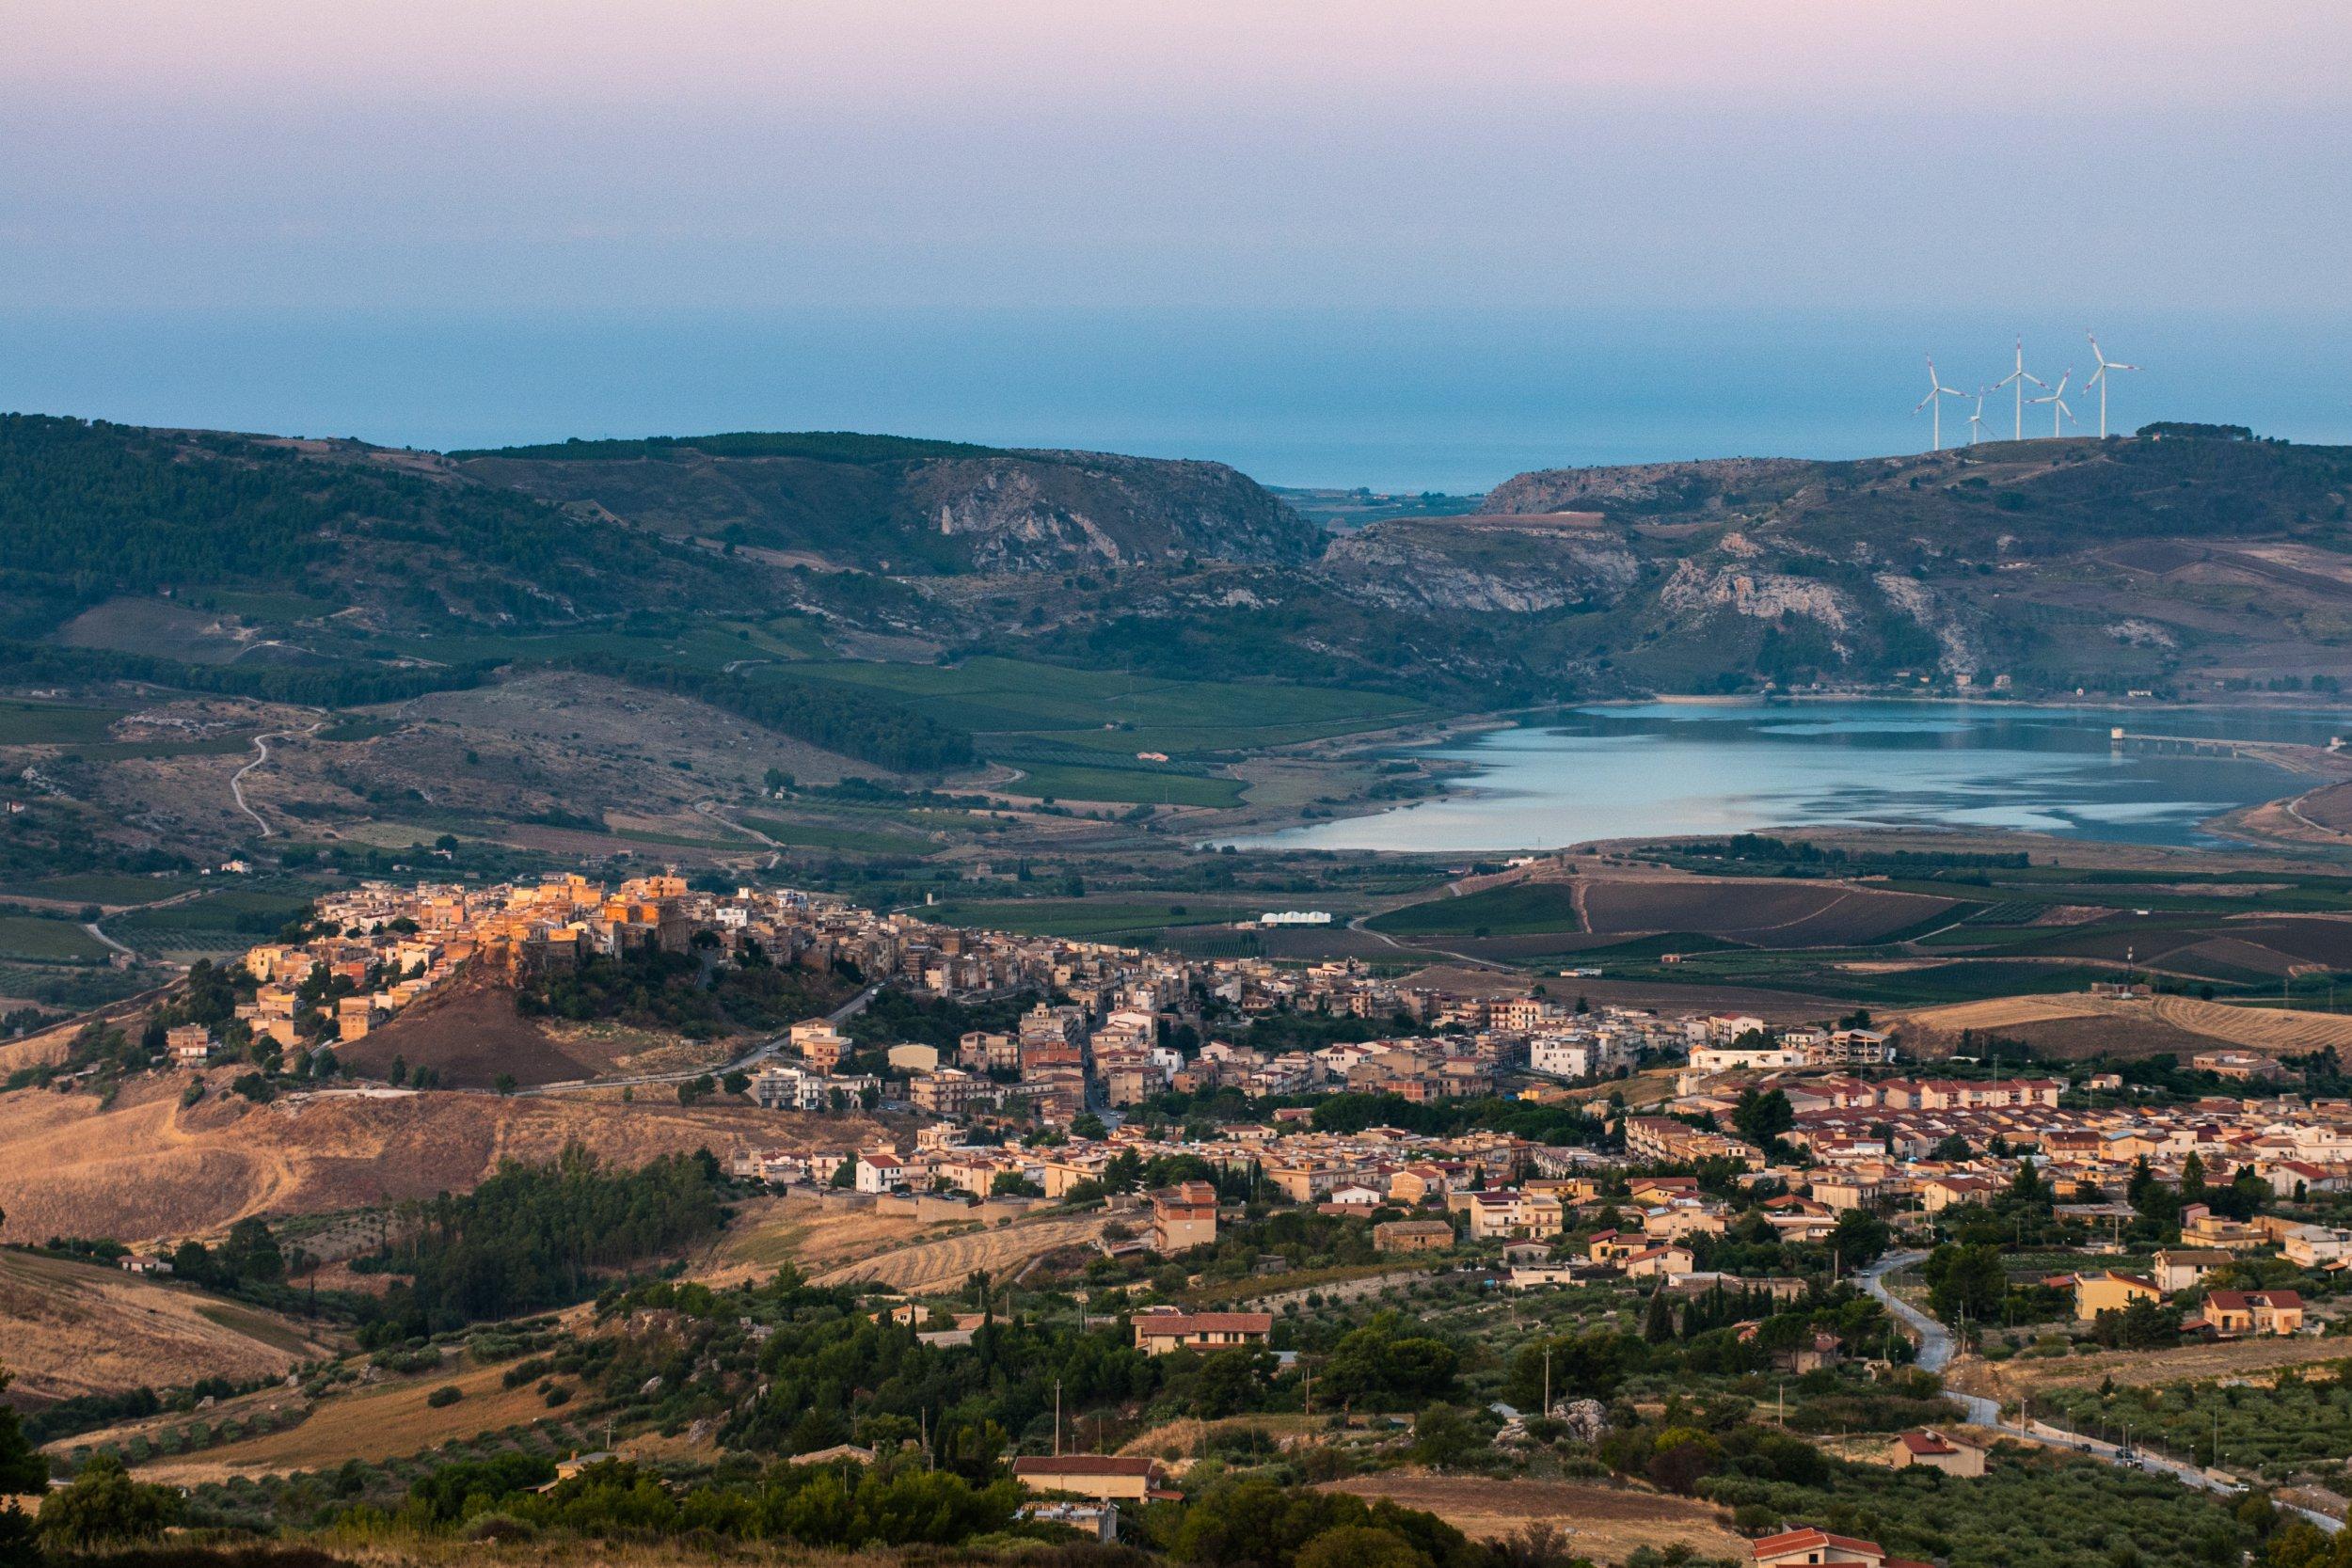 A view of the village of Sambuca di Sicilia, Italy. Sambuca di Sicilia is a municipality in the Province of Agrigento in the Italian region Sicily,; Shutterstock ID 1031137342; Purchase Order: -